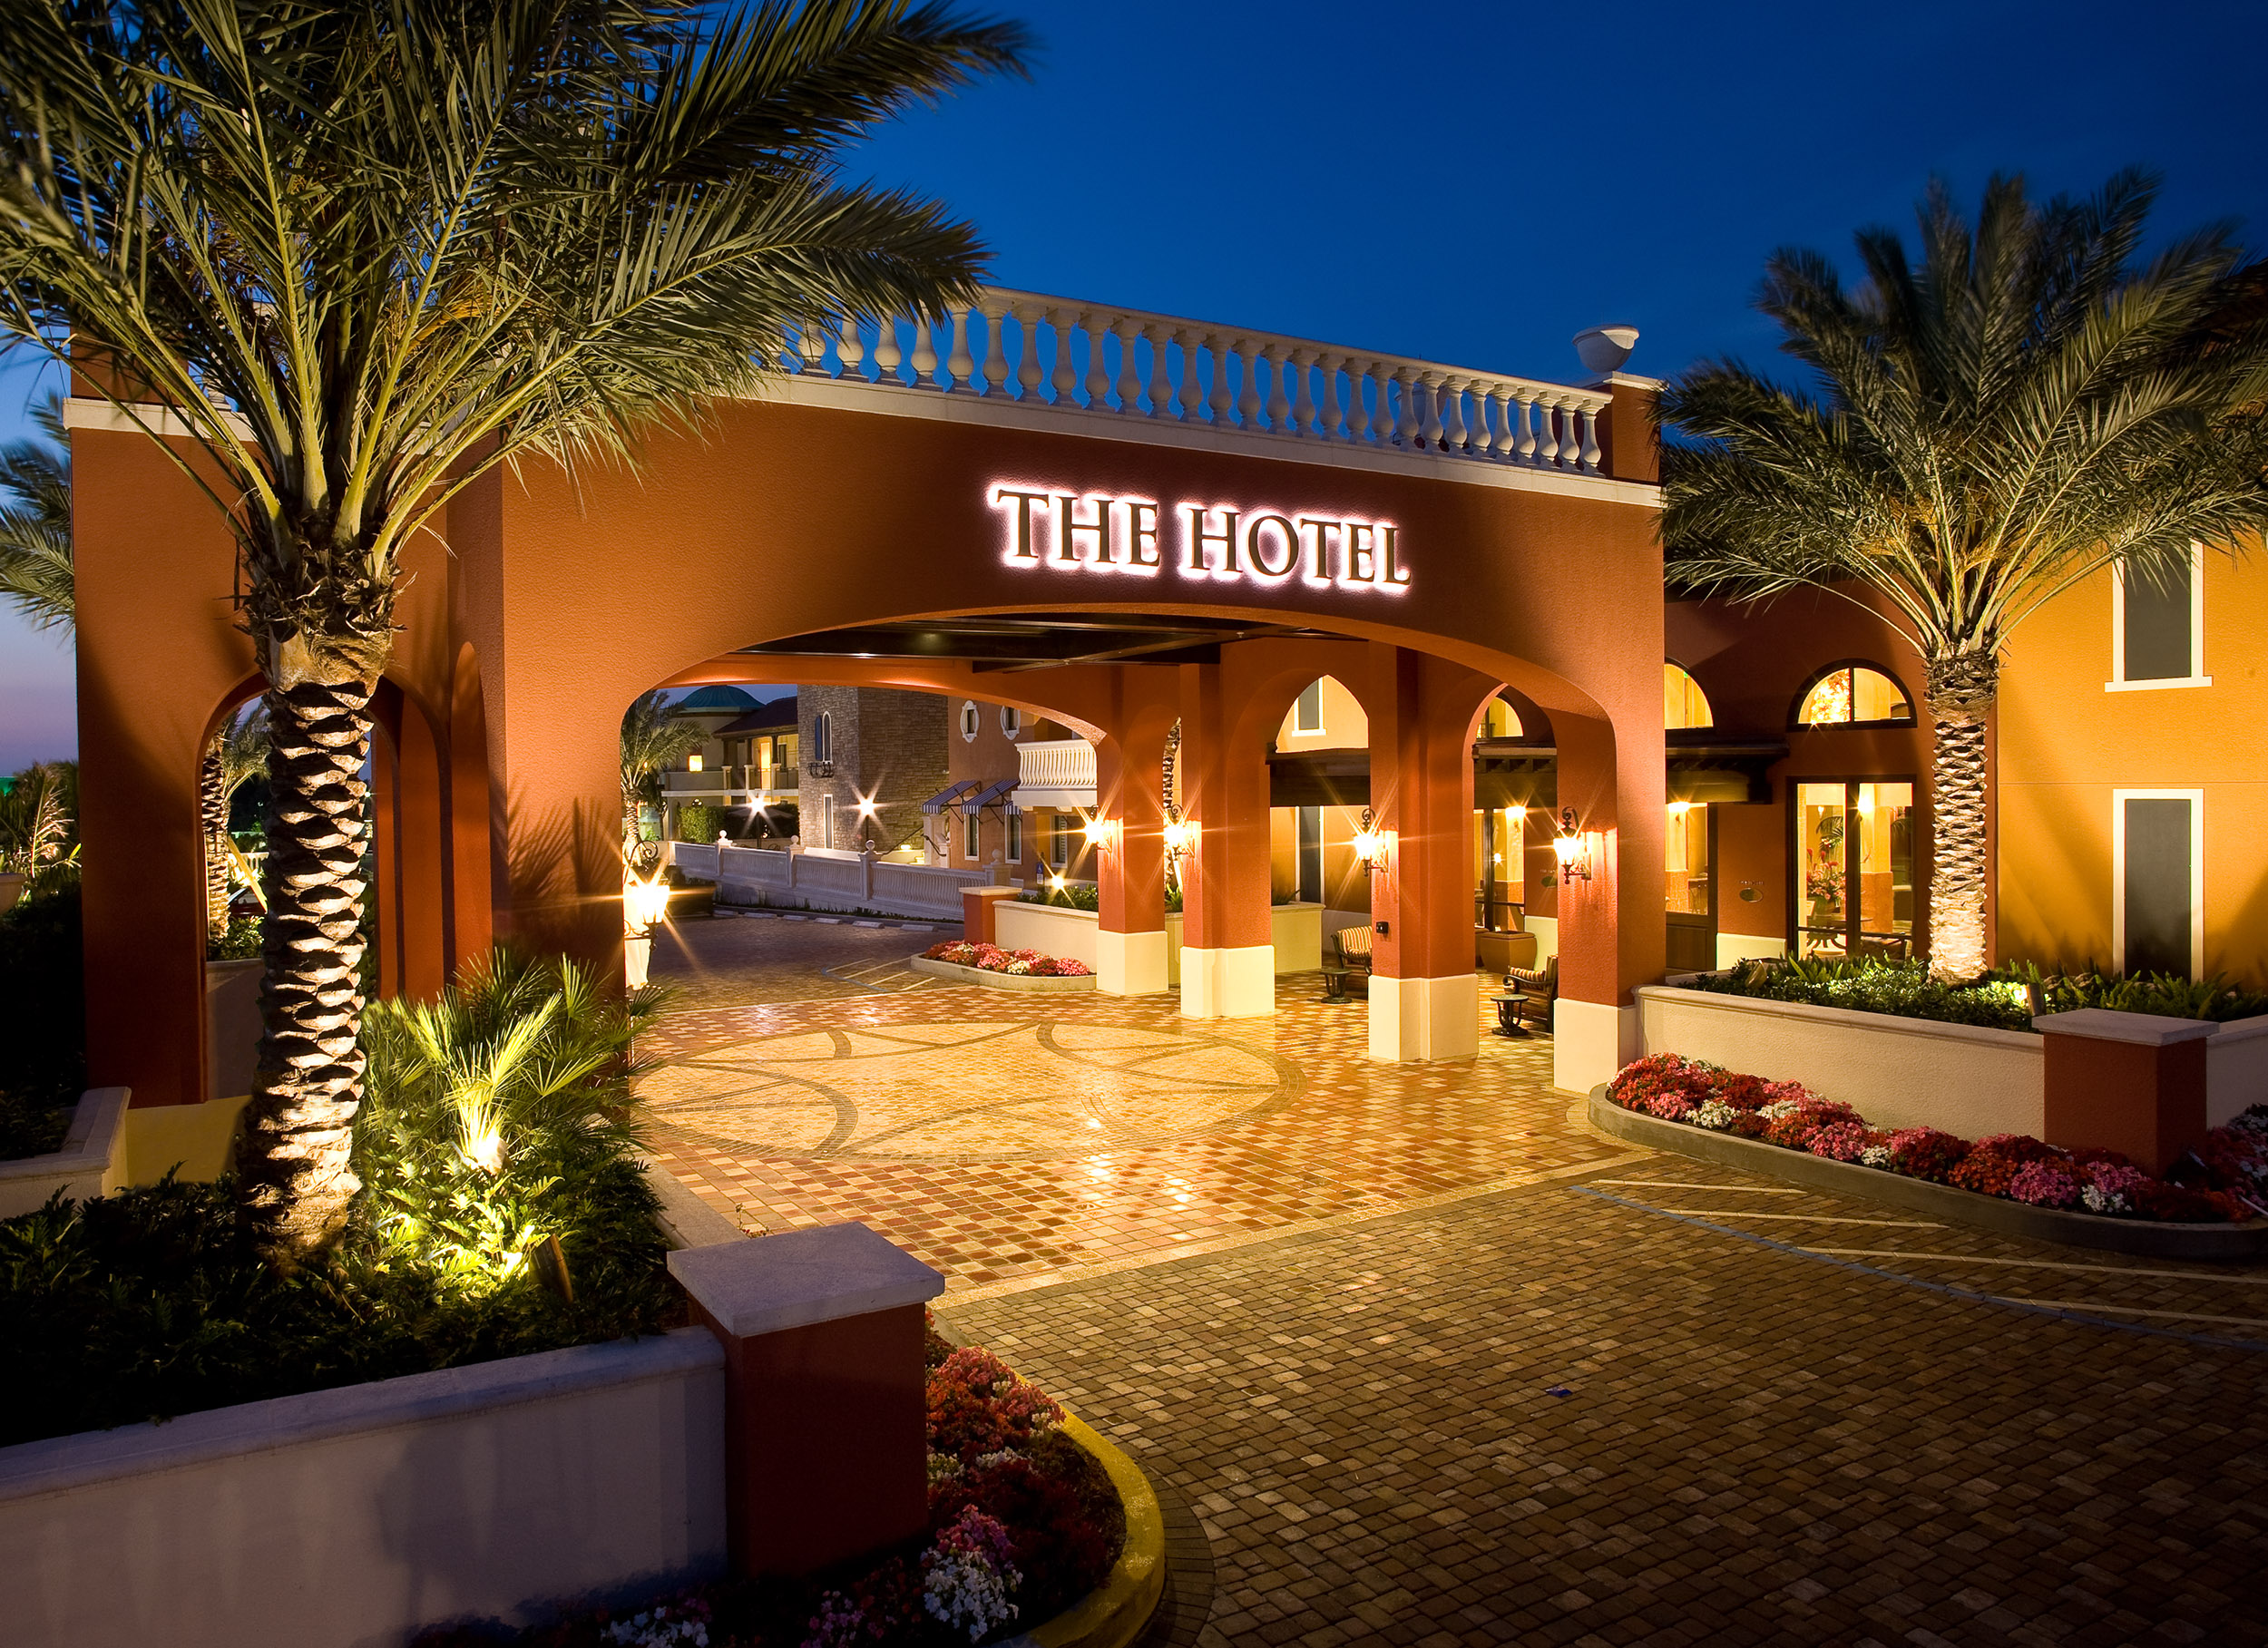 Naples Bay Resort - The Hotel